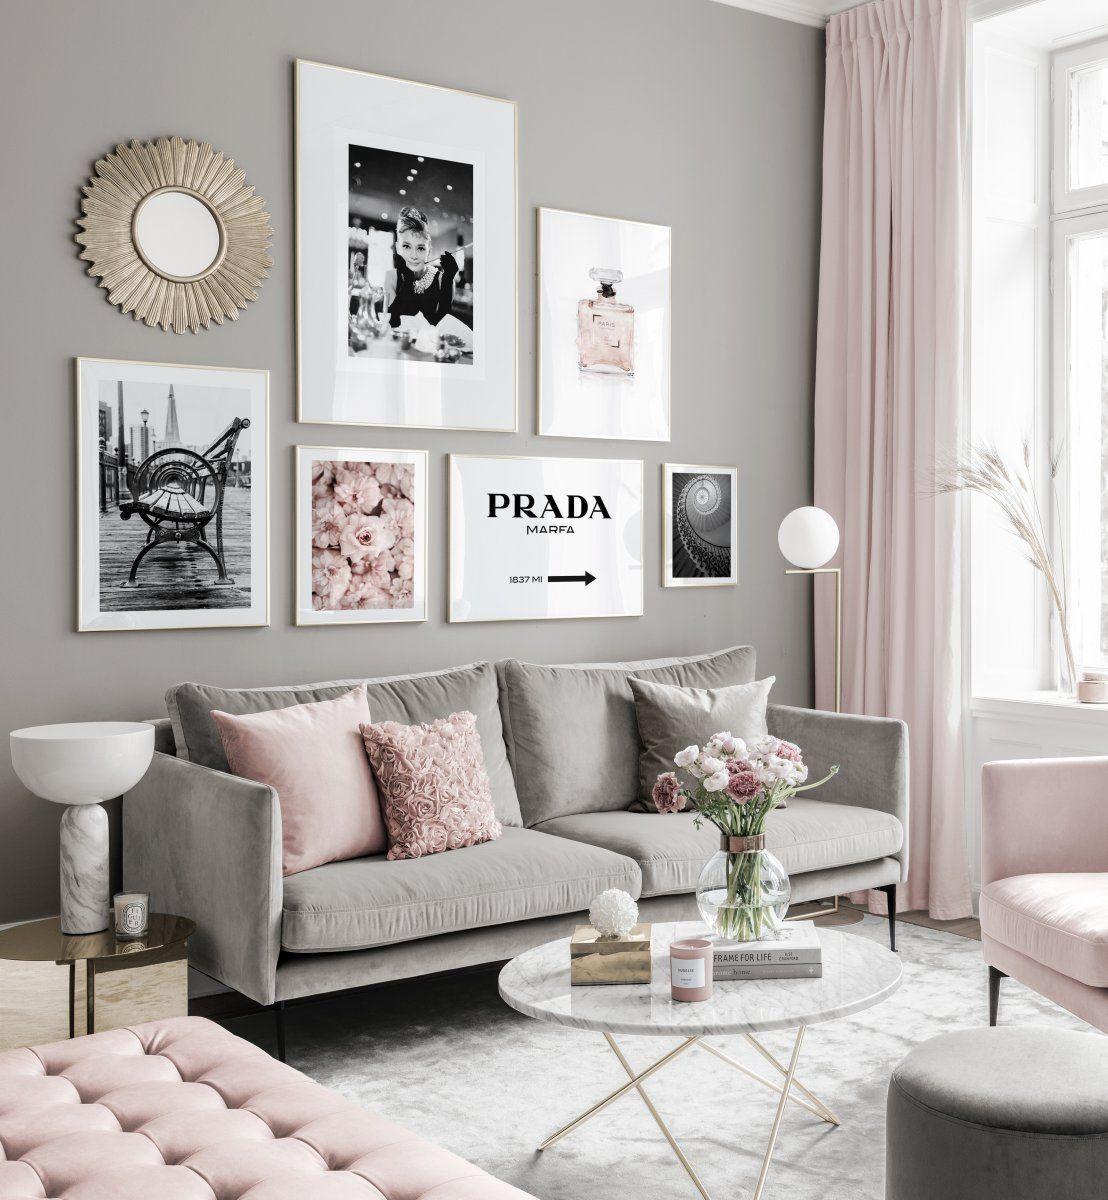 Moderne Bilderwand Schwarzweisse Poster Rosafarbene Tone Goldrahmen Pink Living Room Living Room Decor Apartment Living Room Inspiration